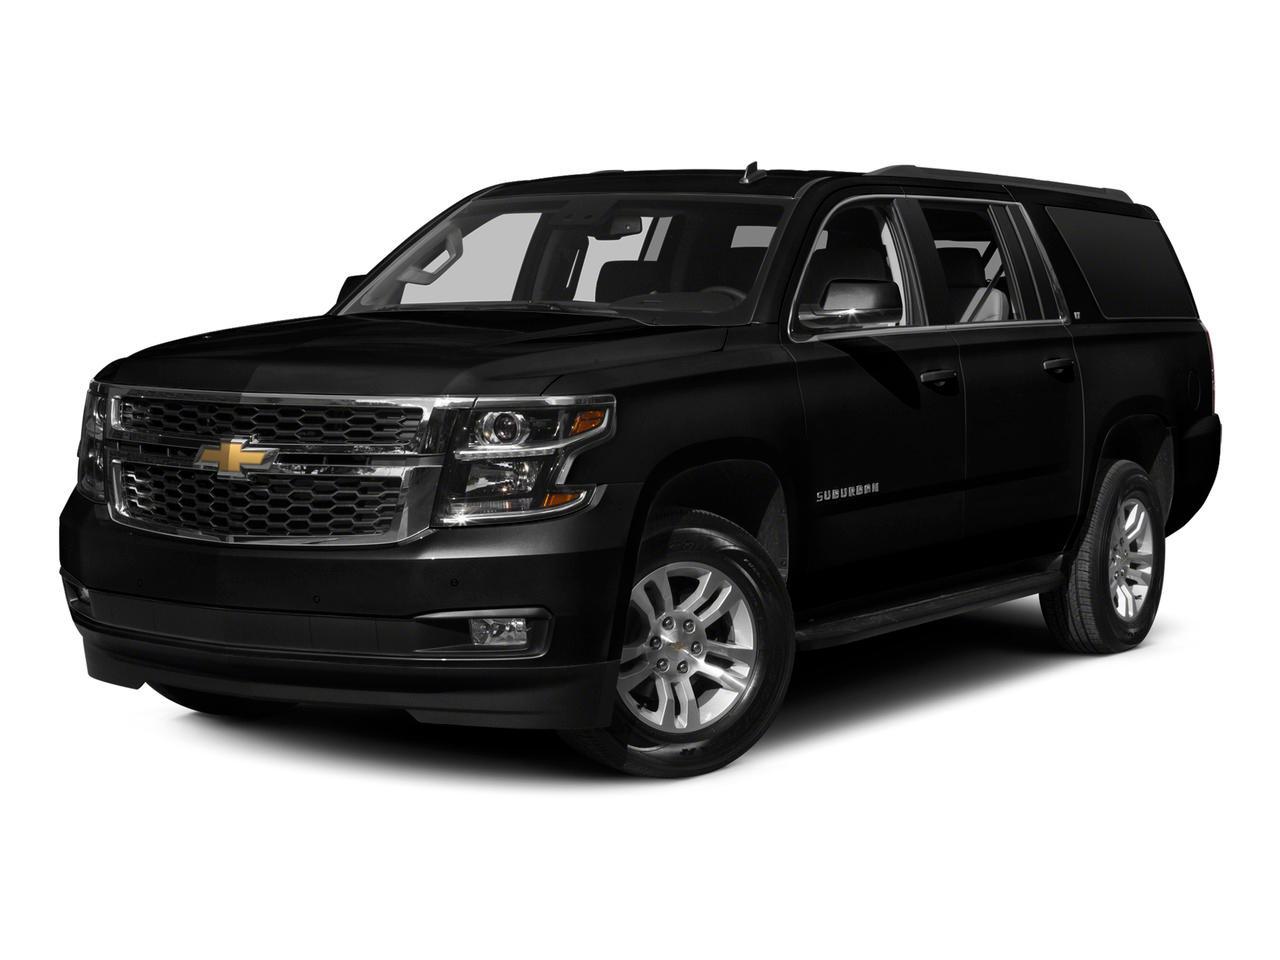 2015 Chevrolet Suburban Vehicle Photo in Odessa, TX 79762